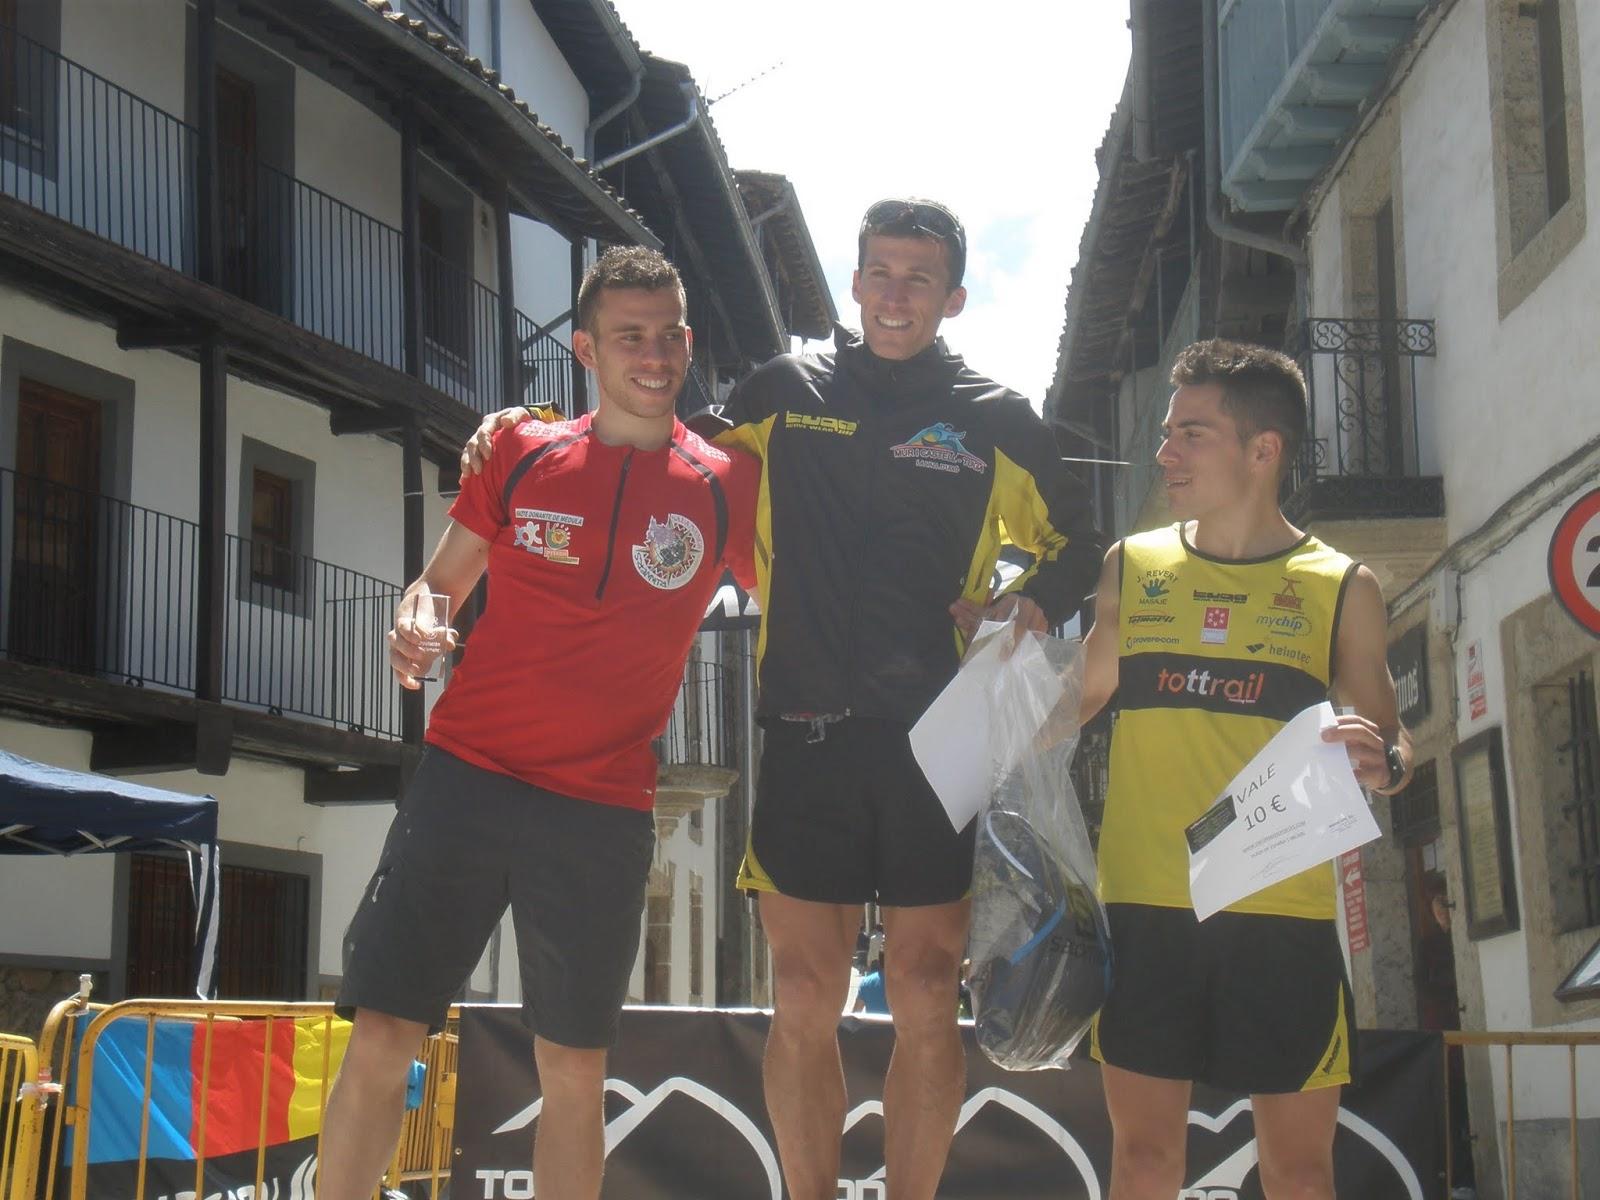 Podium masculino del kilometro vertical Candelario 2013